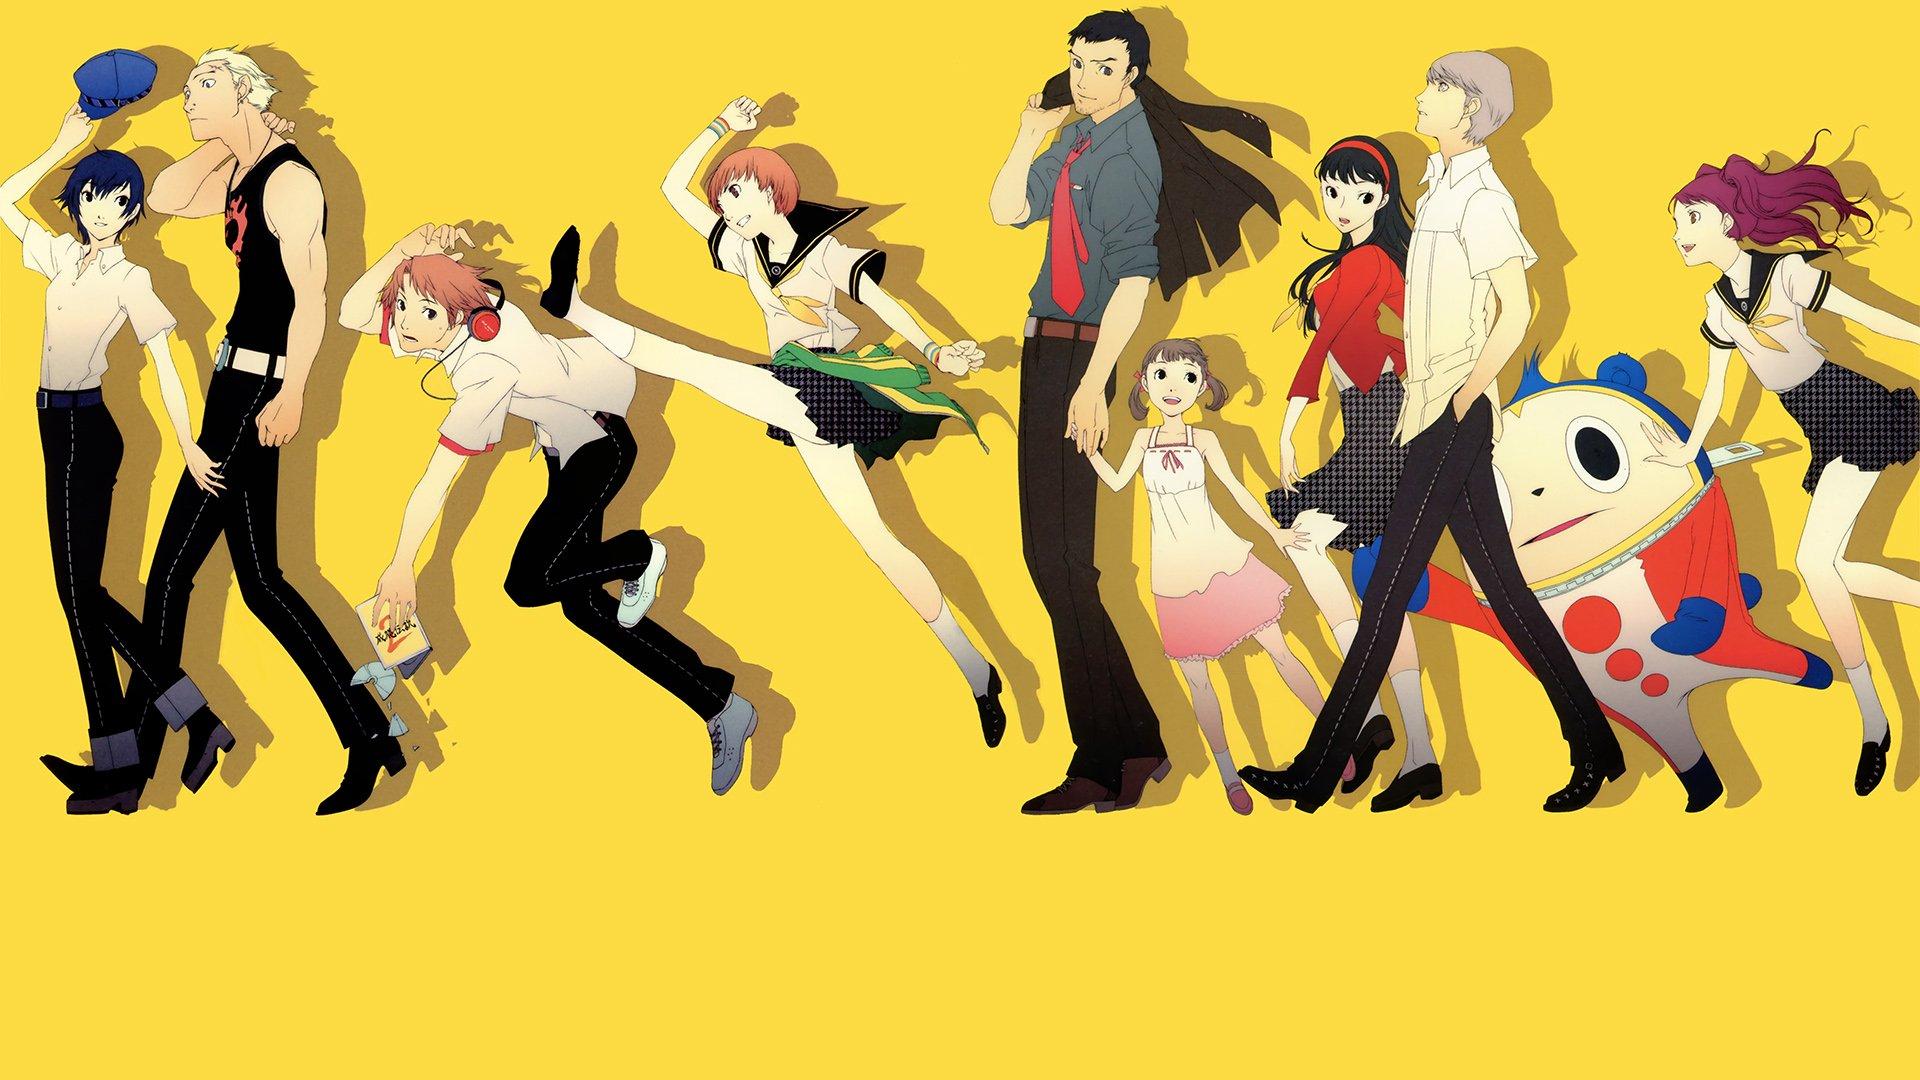 Persona 4 HD Wallpaper | Background Image | 1920x1080 | ID ...